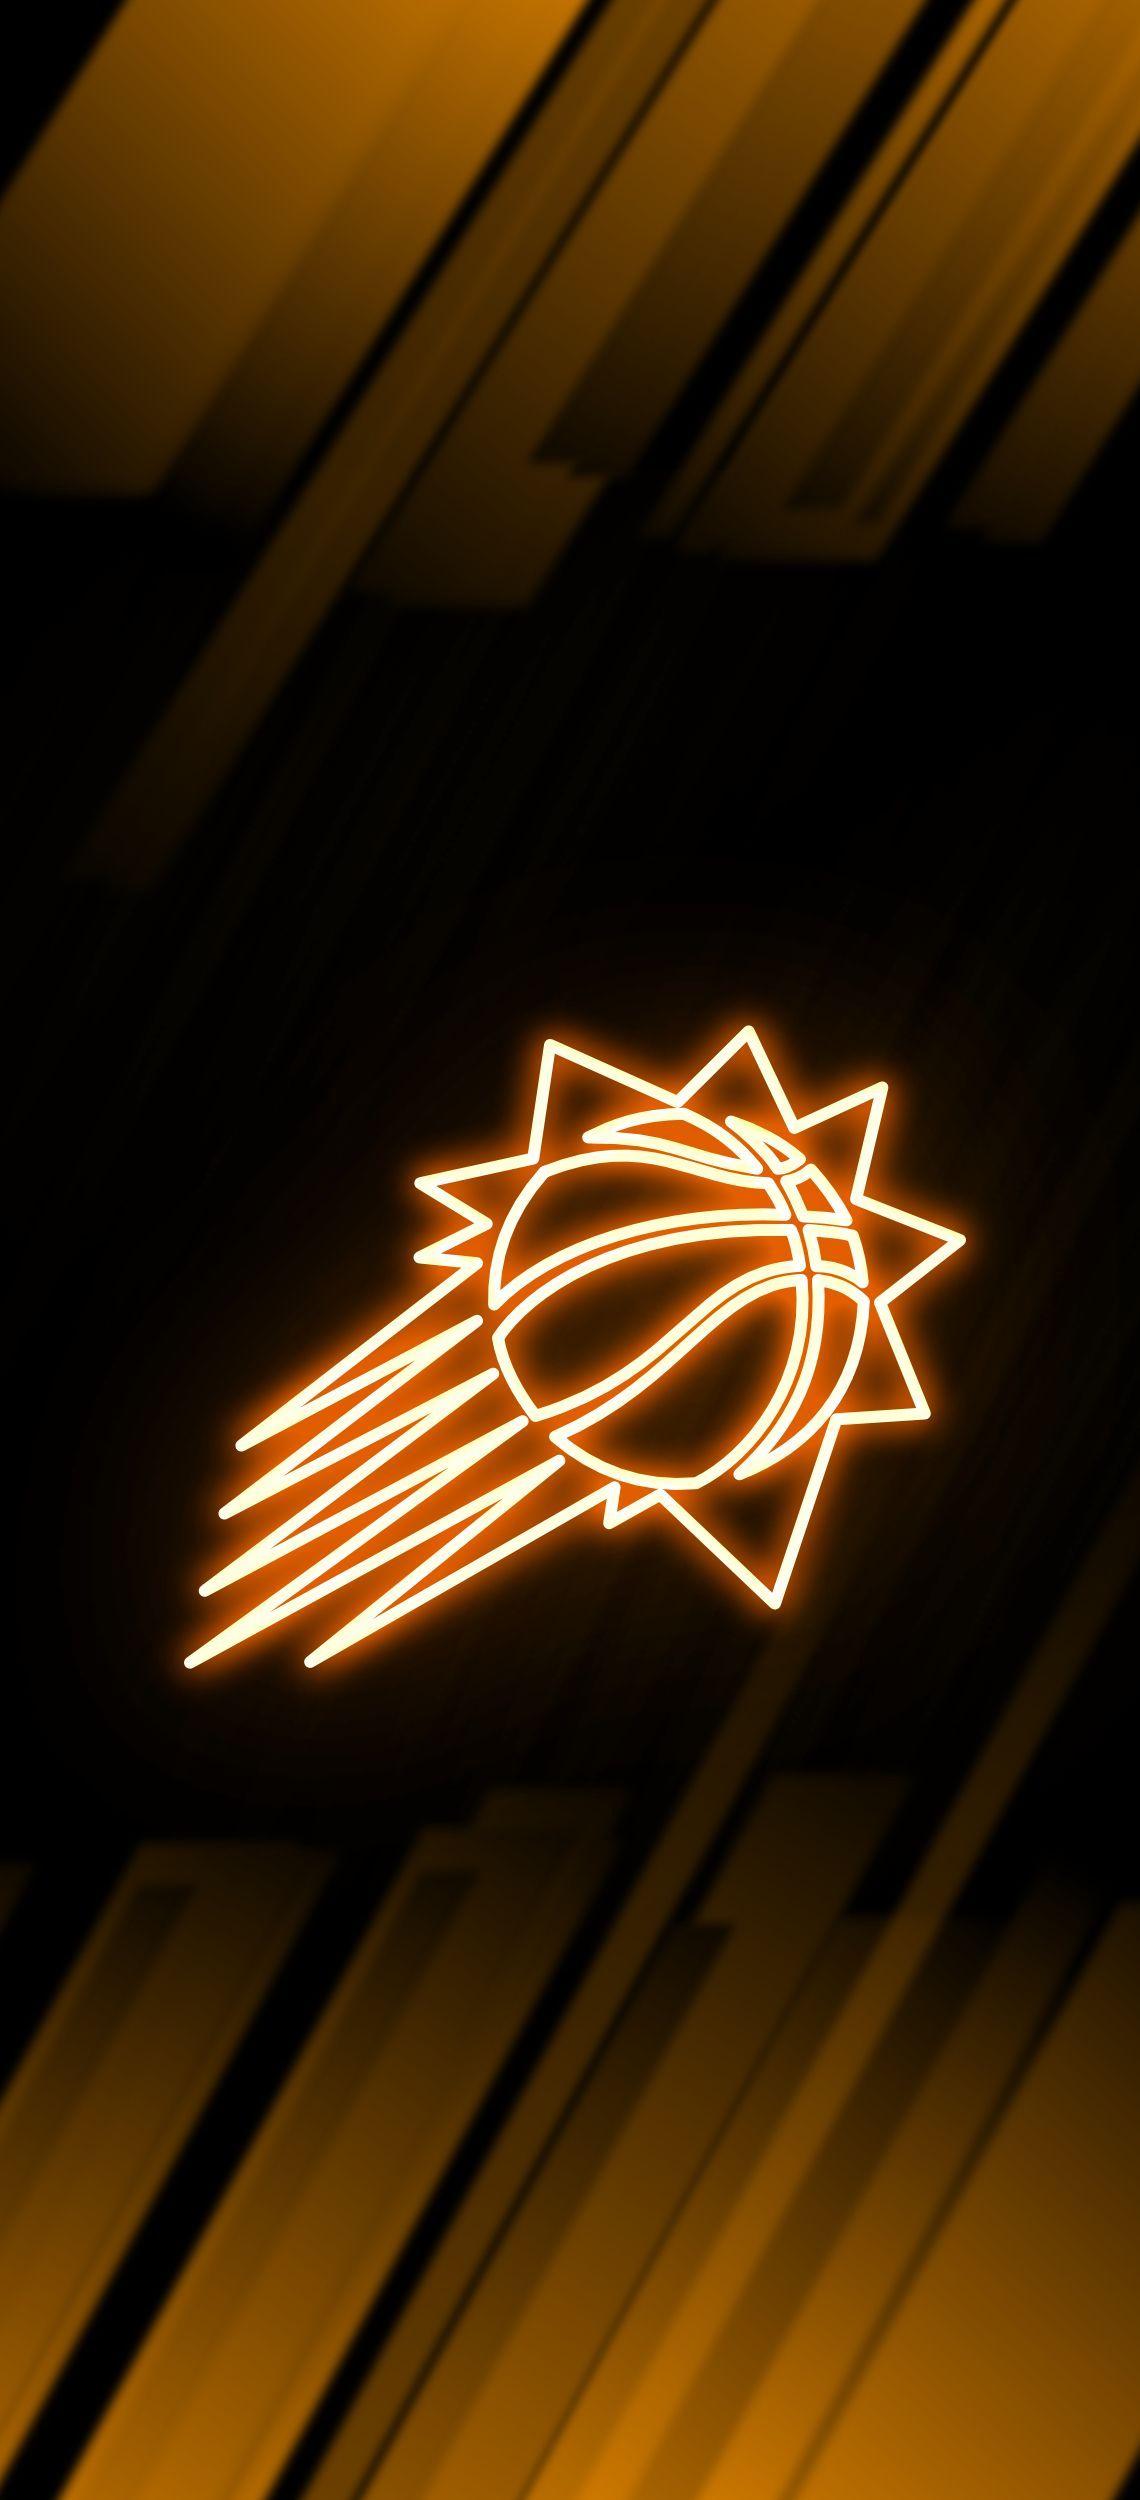 Phoenix Suns Neon Wallpaper Basketball Phoenix Suns Neon Wallpaper Basketball Wallpaper